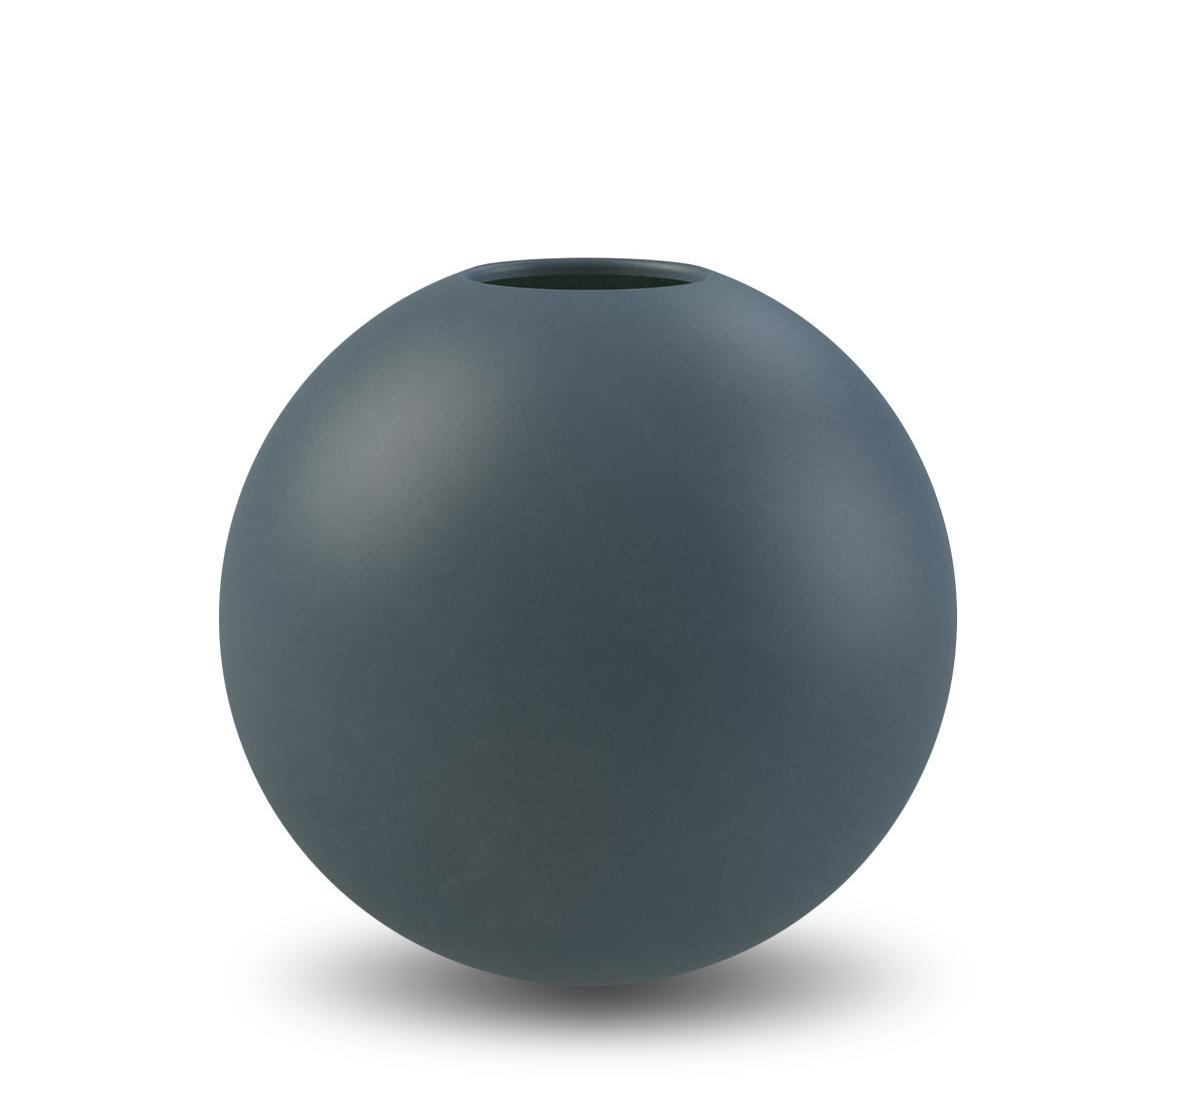 COOEE Design Kulatá váza Ball Midnight Blue 10 cm, modrá barva, keramika